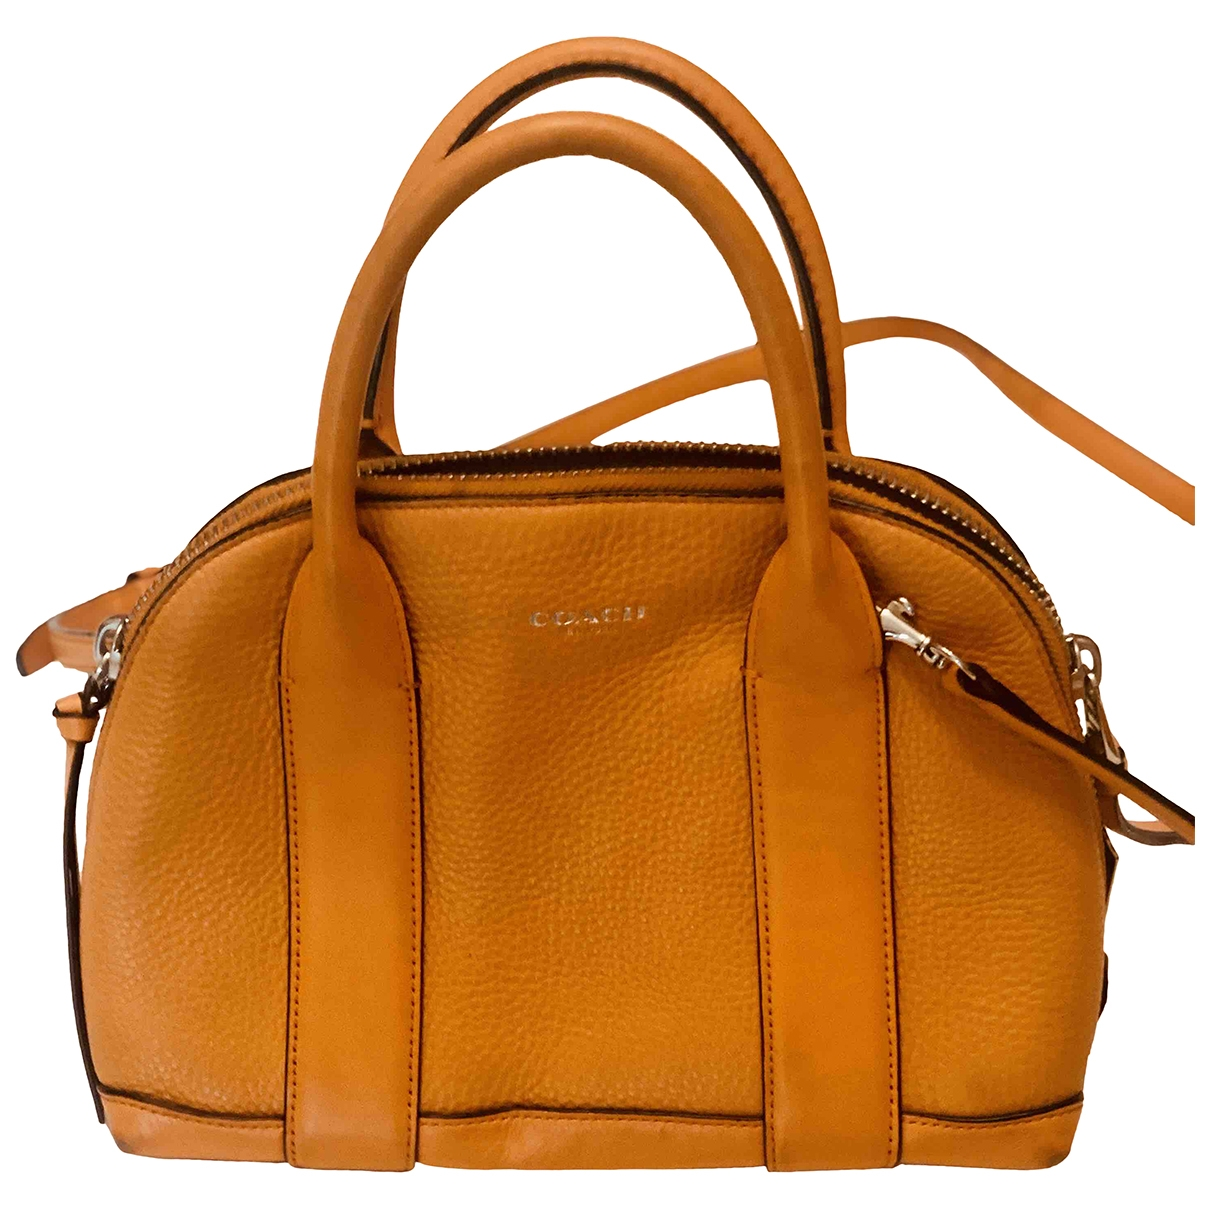 Coach \N Orange Leather handbag for Women \N